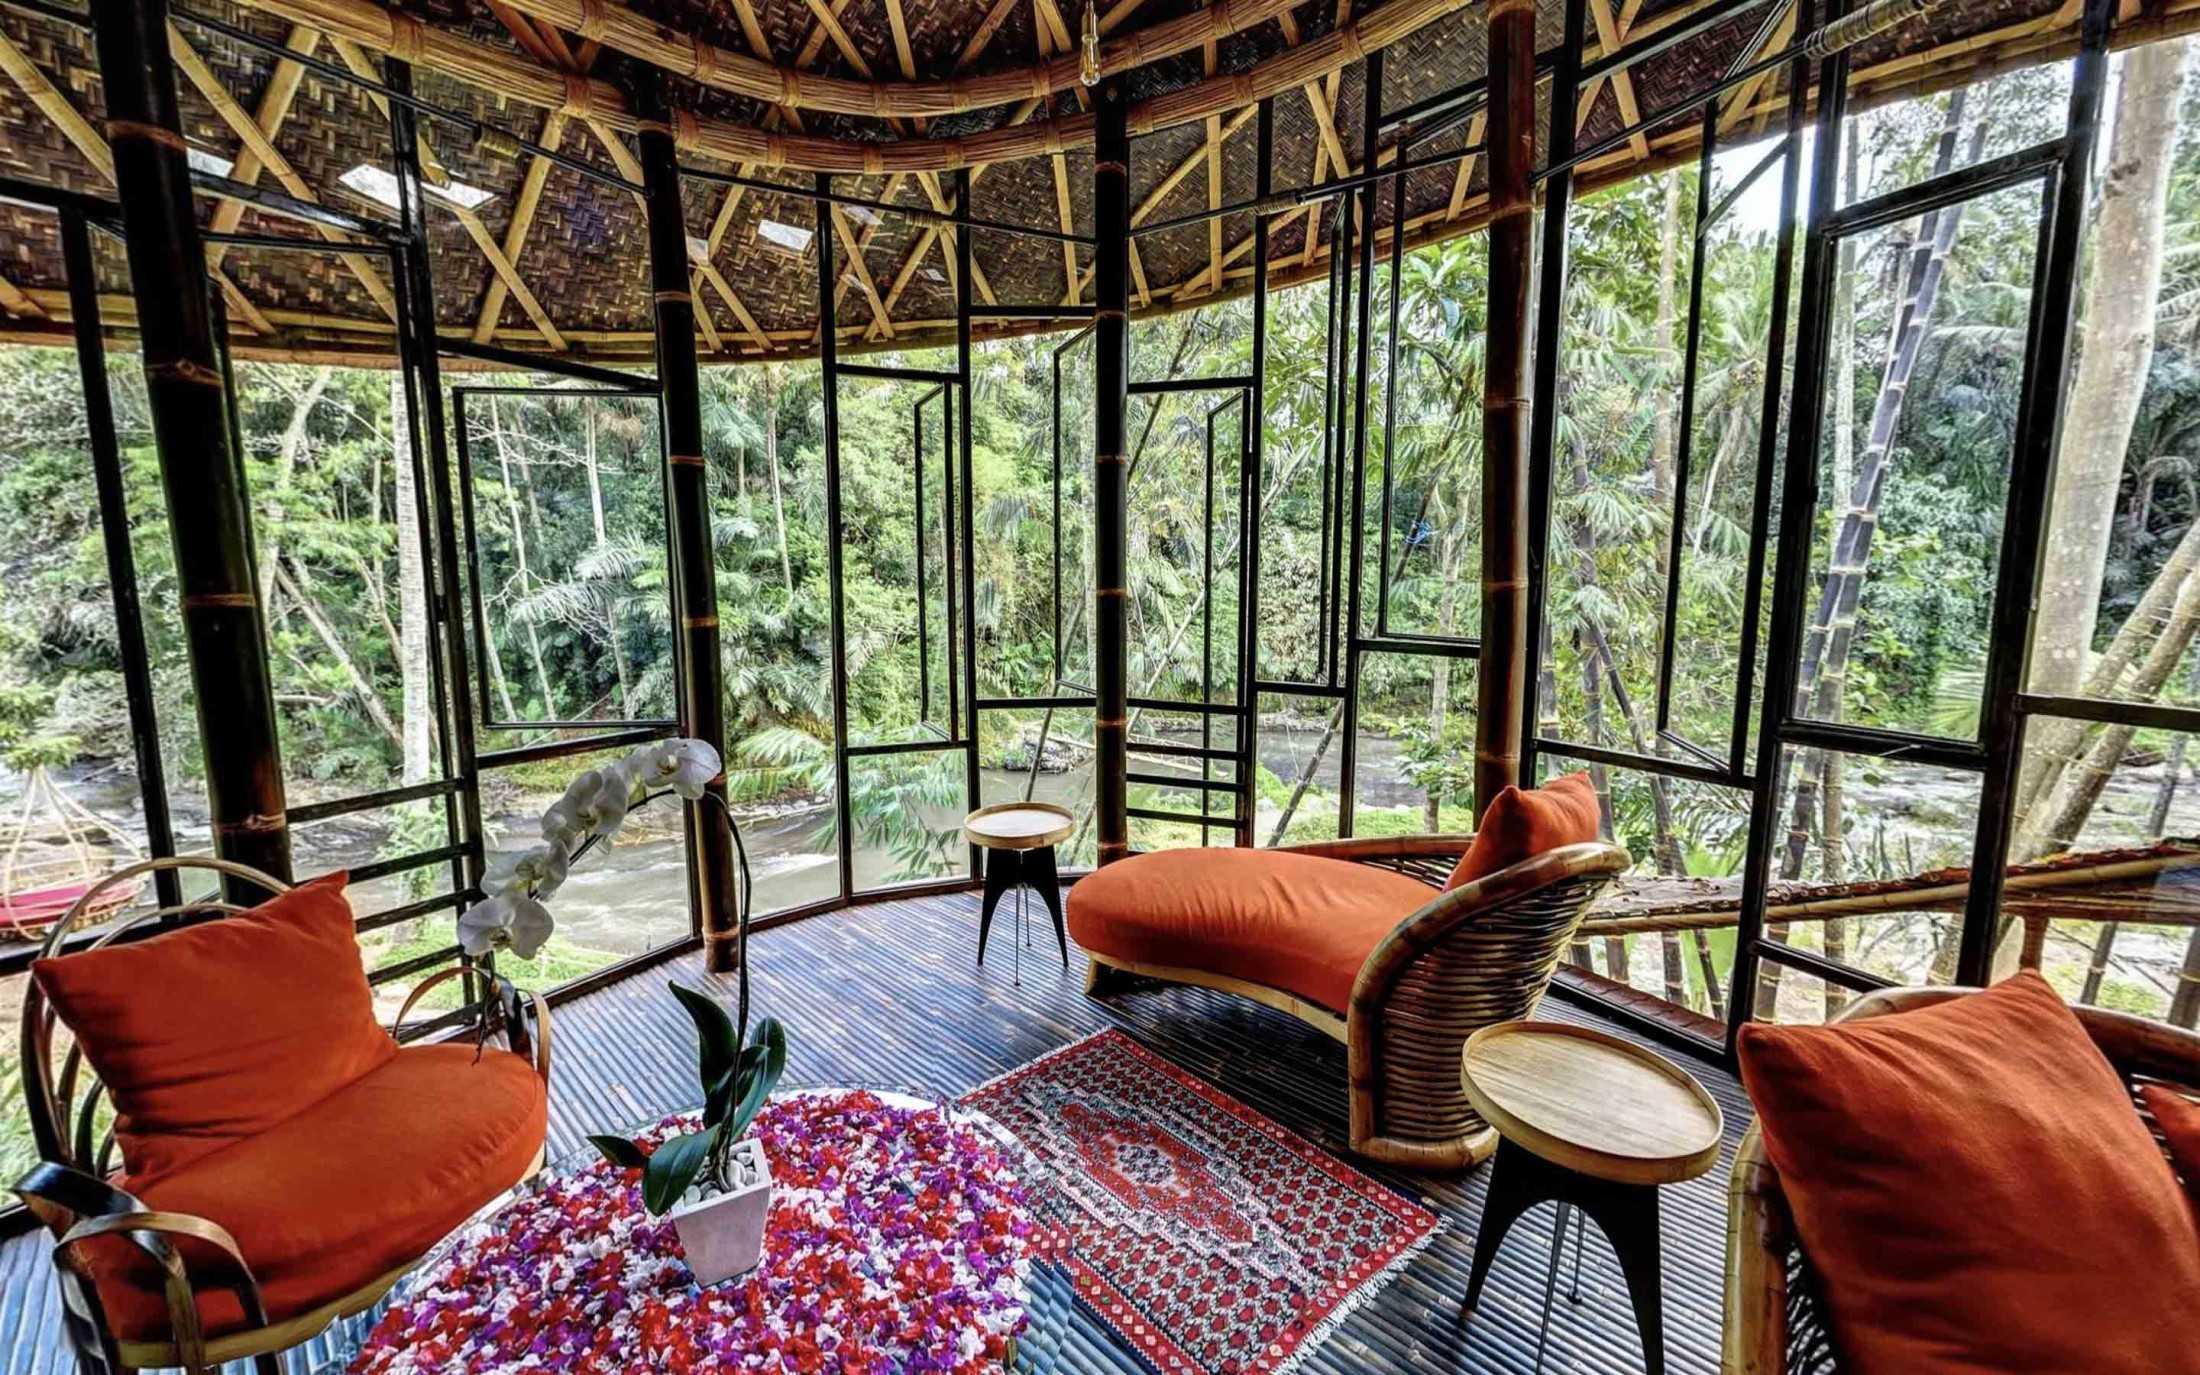 Agung Budi Raharsa | Architecture & Engineering Riverbend Bamboo House - Bali Bali, Indonesia Bali, Indonesia Agung-Budi-Raharsa-Riverbend-House-Bali  88711